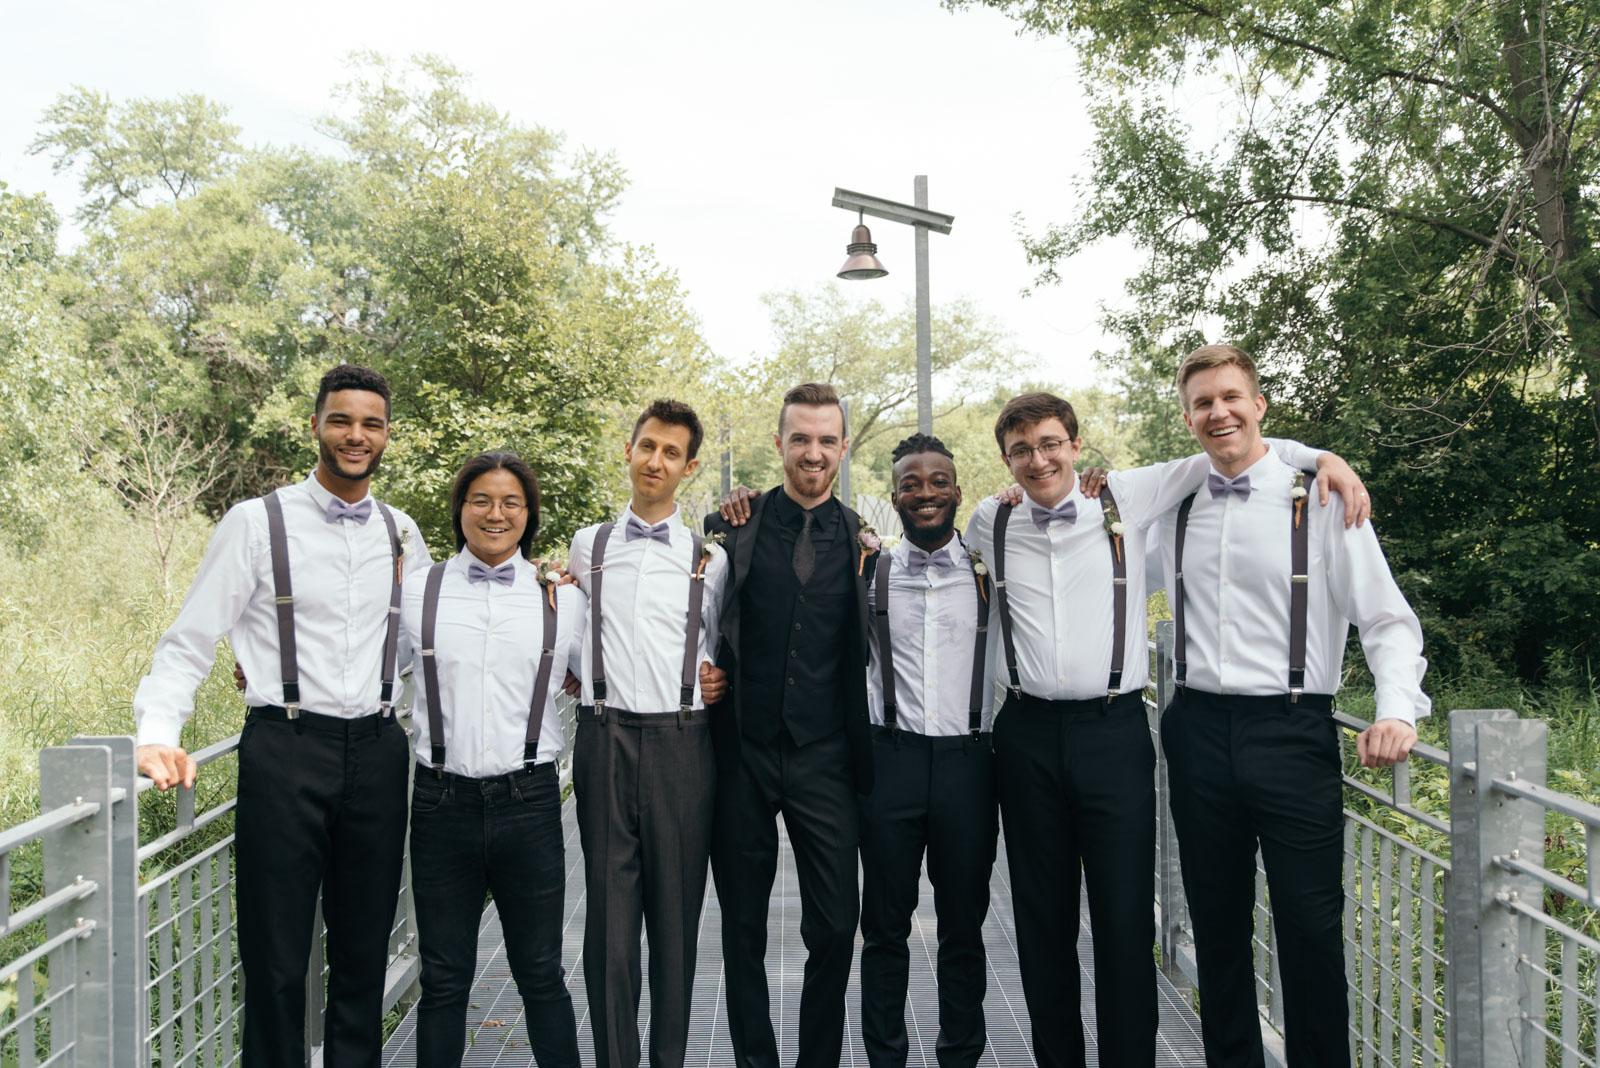 groom with groomsmen at Coralville Marriott Hotel Wedding